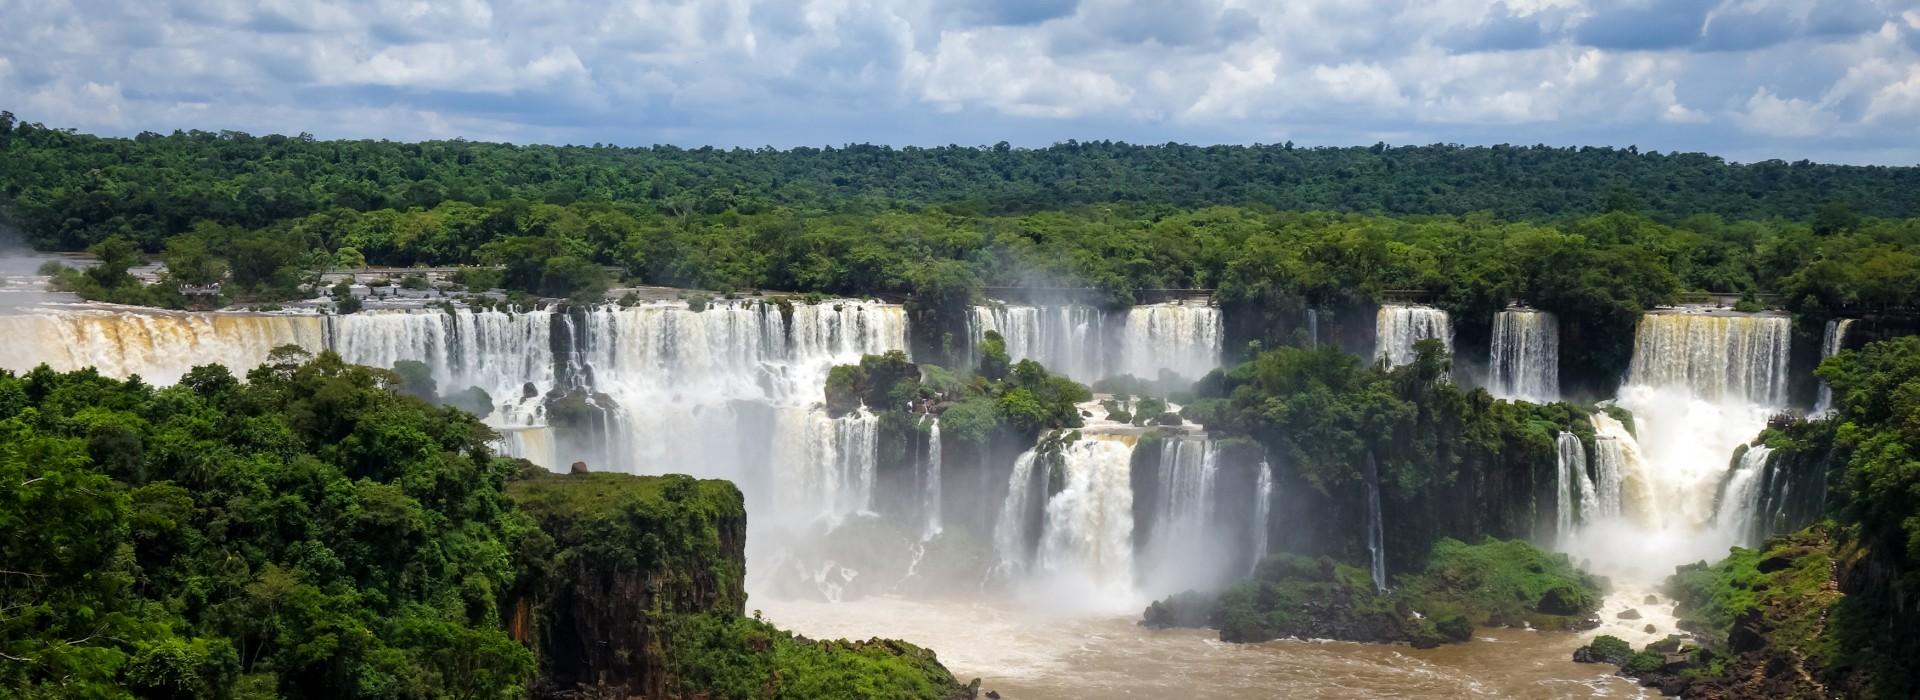 Iguazu Falls Tours and Holidays 2019/2020